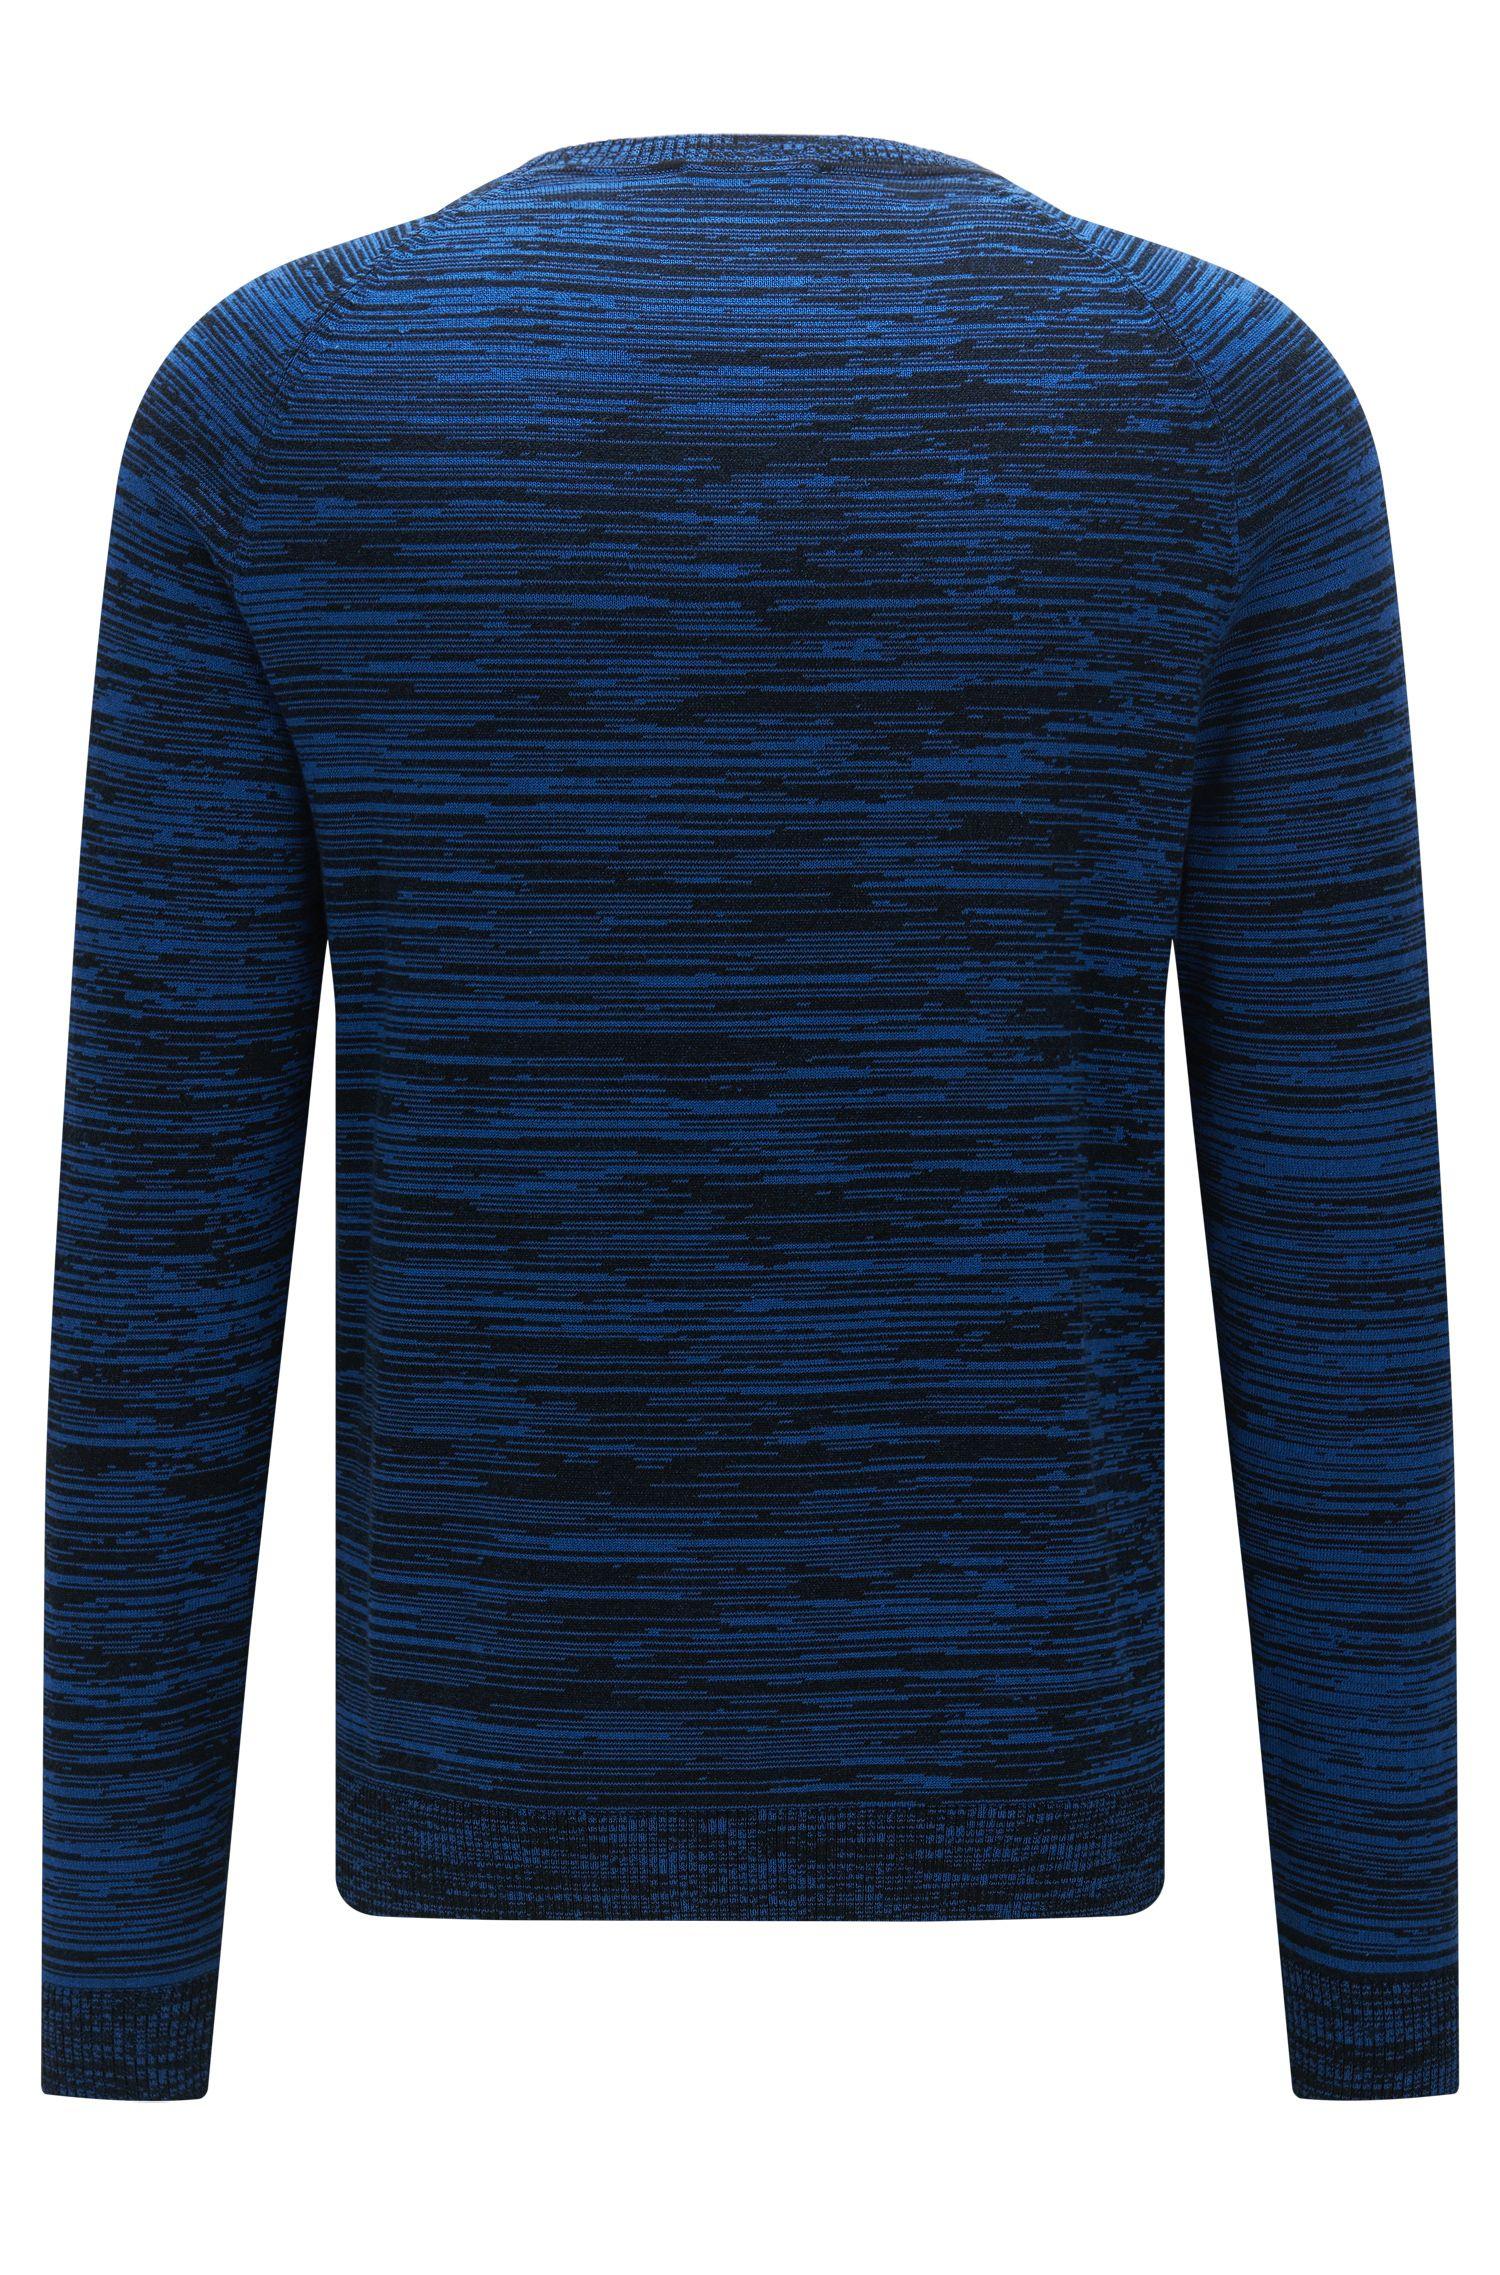 Srolon | Slim fit, Melange Stripe Cotton Sweater